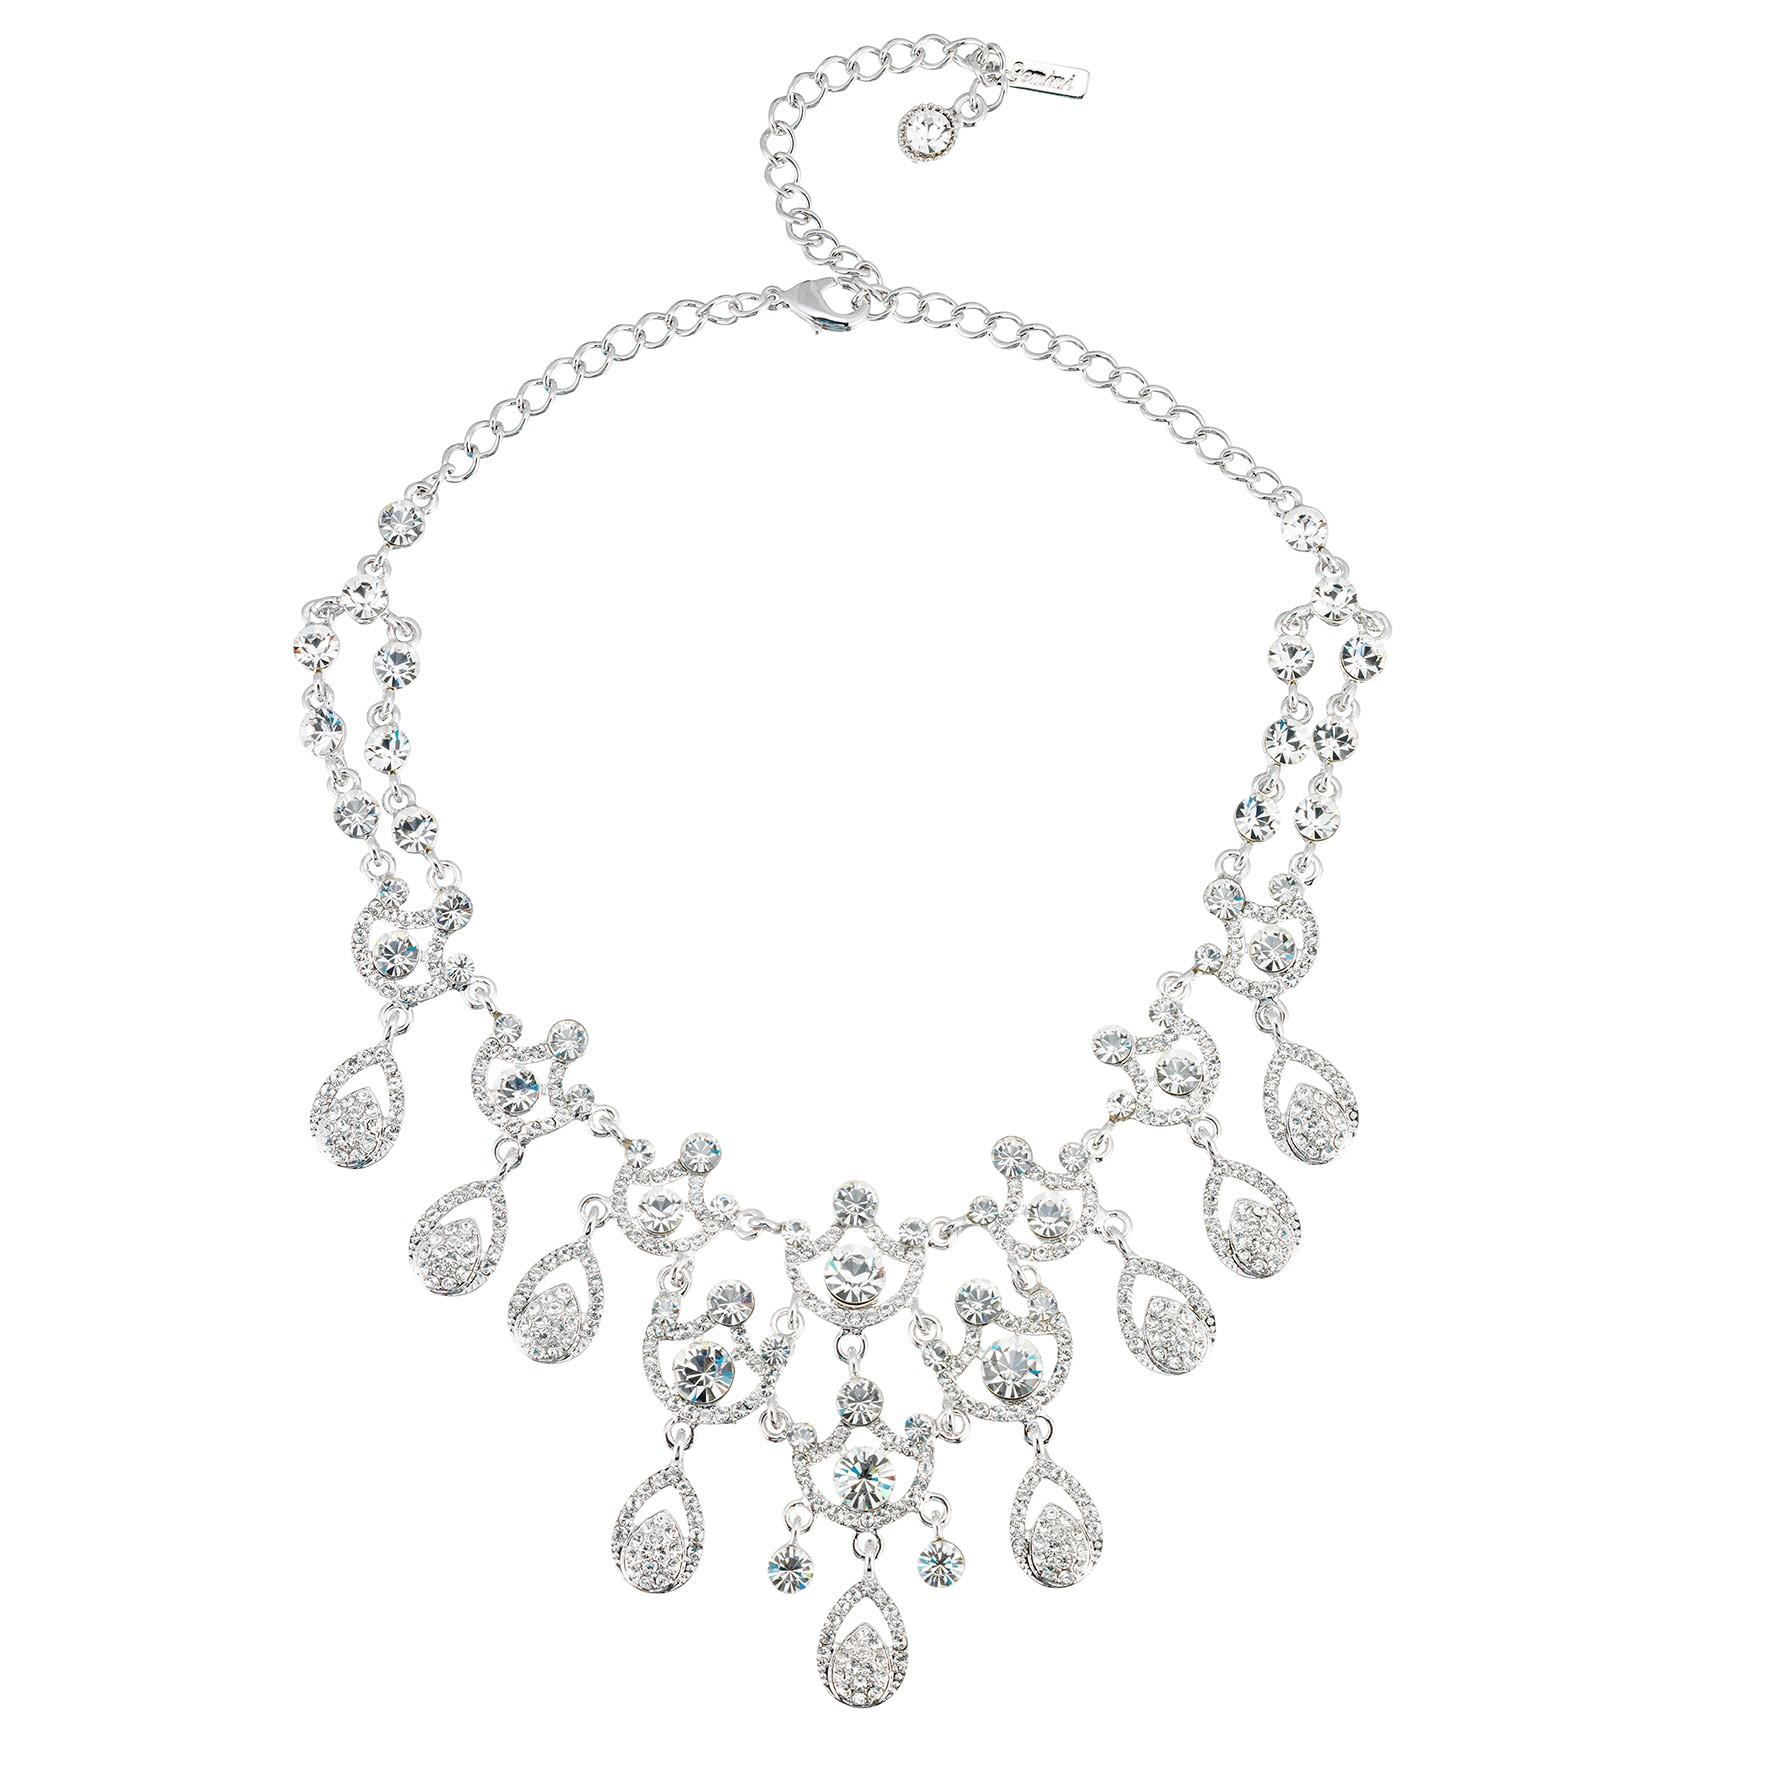 Swarovski crystal clear crystal necklace 9 ornate chandelier clear crystal necklace 9 ornate chandelier teardrop swarovski clear crystals aloadofball Choice Image